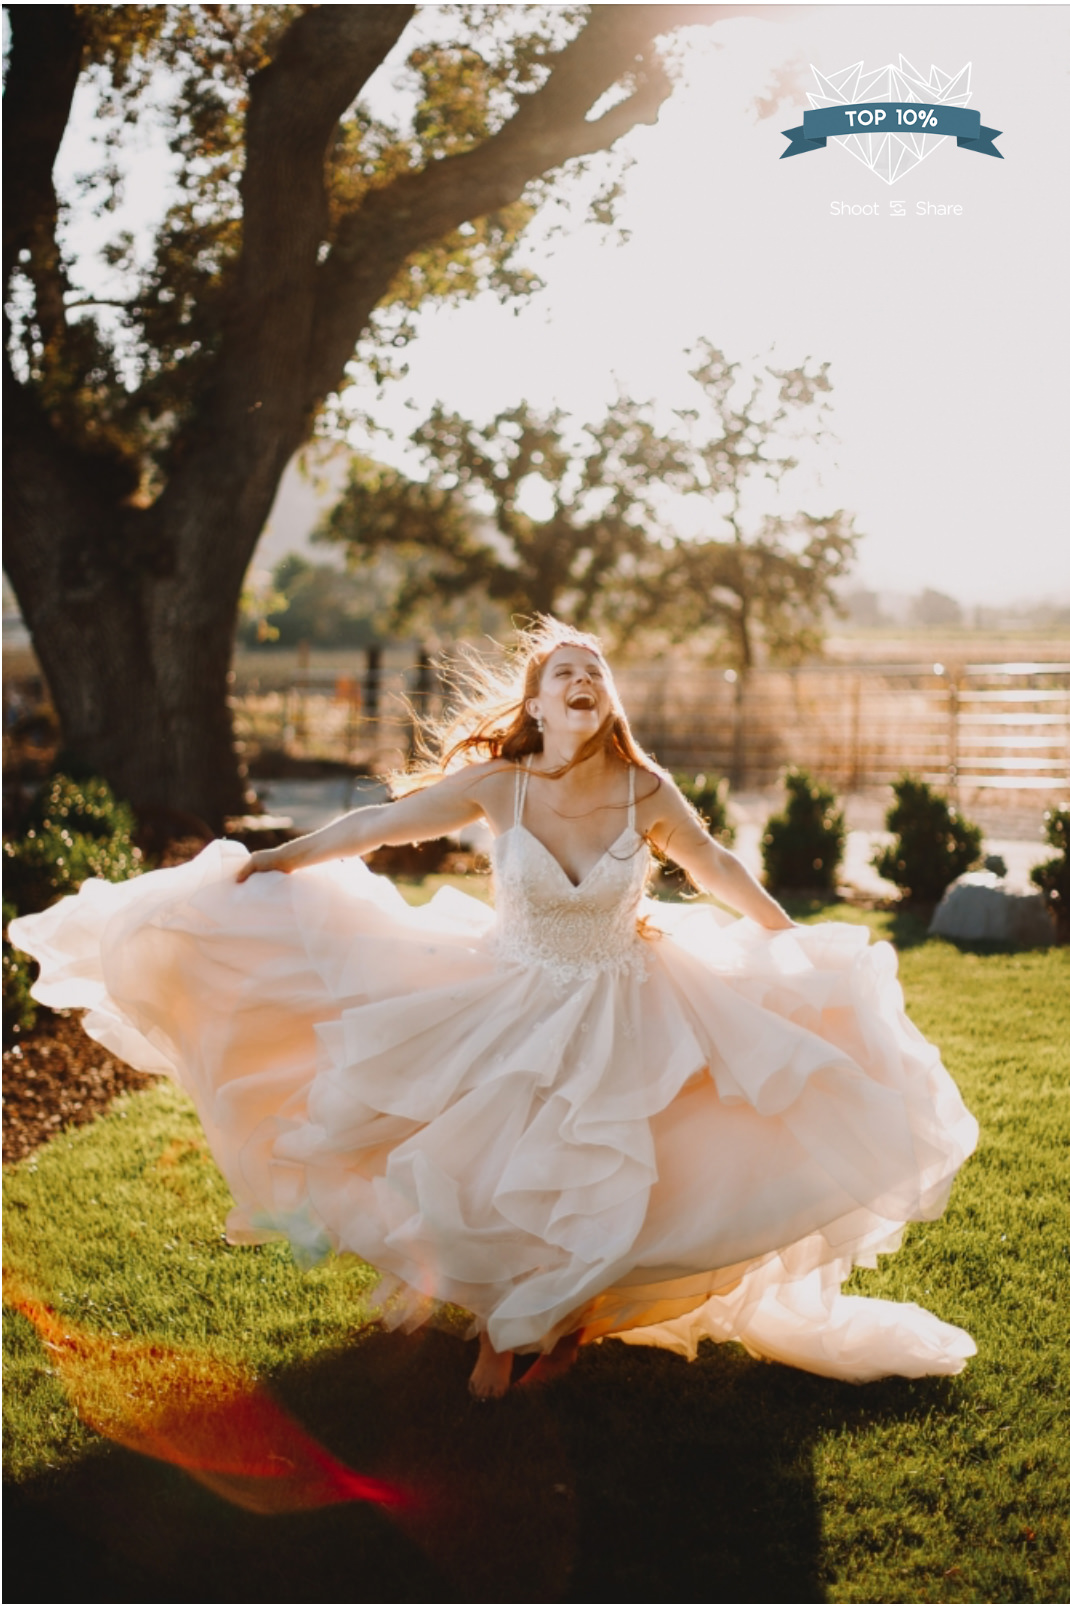 Category: Styled Wedding | Place: 534/6,998